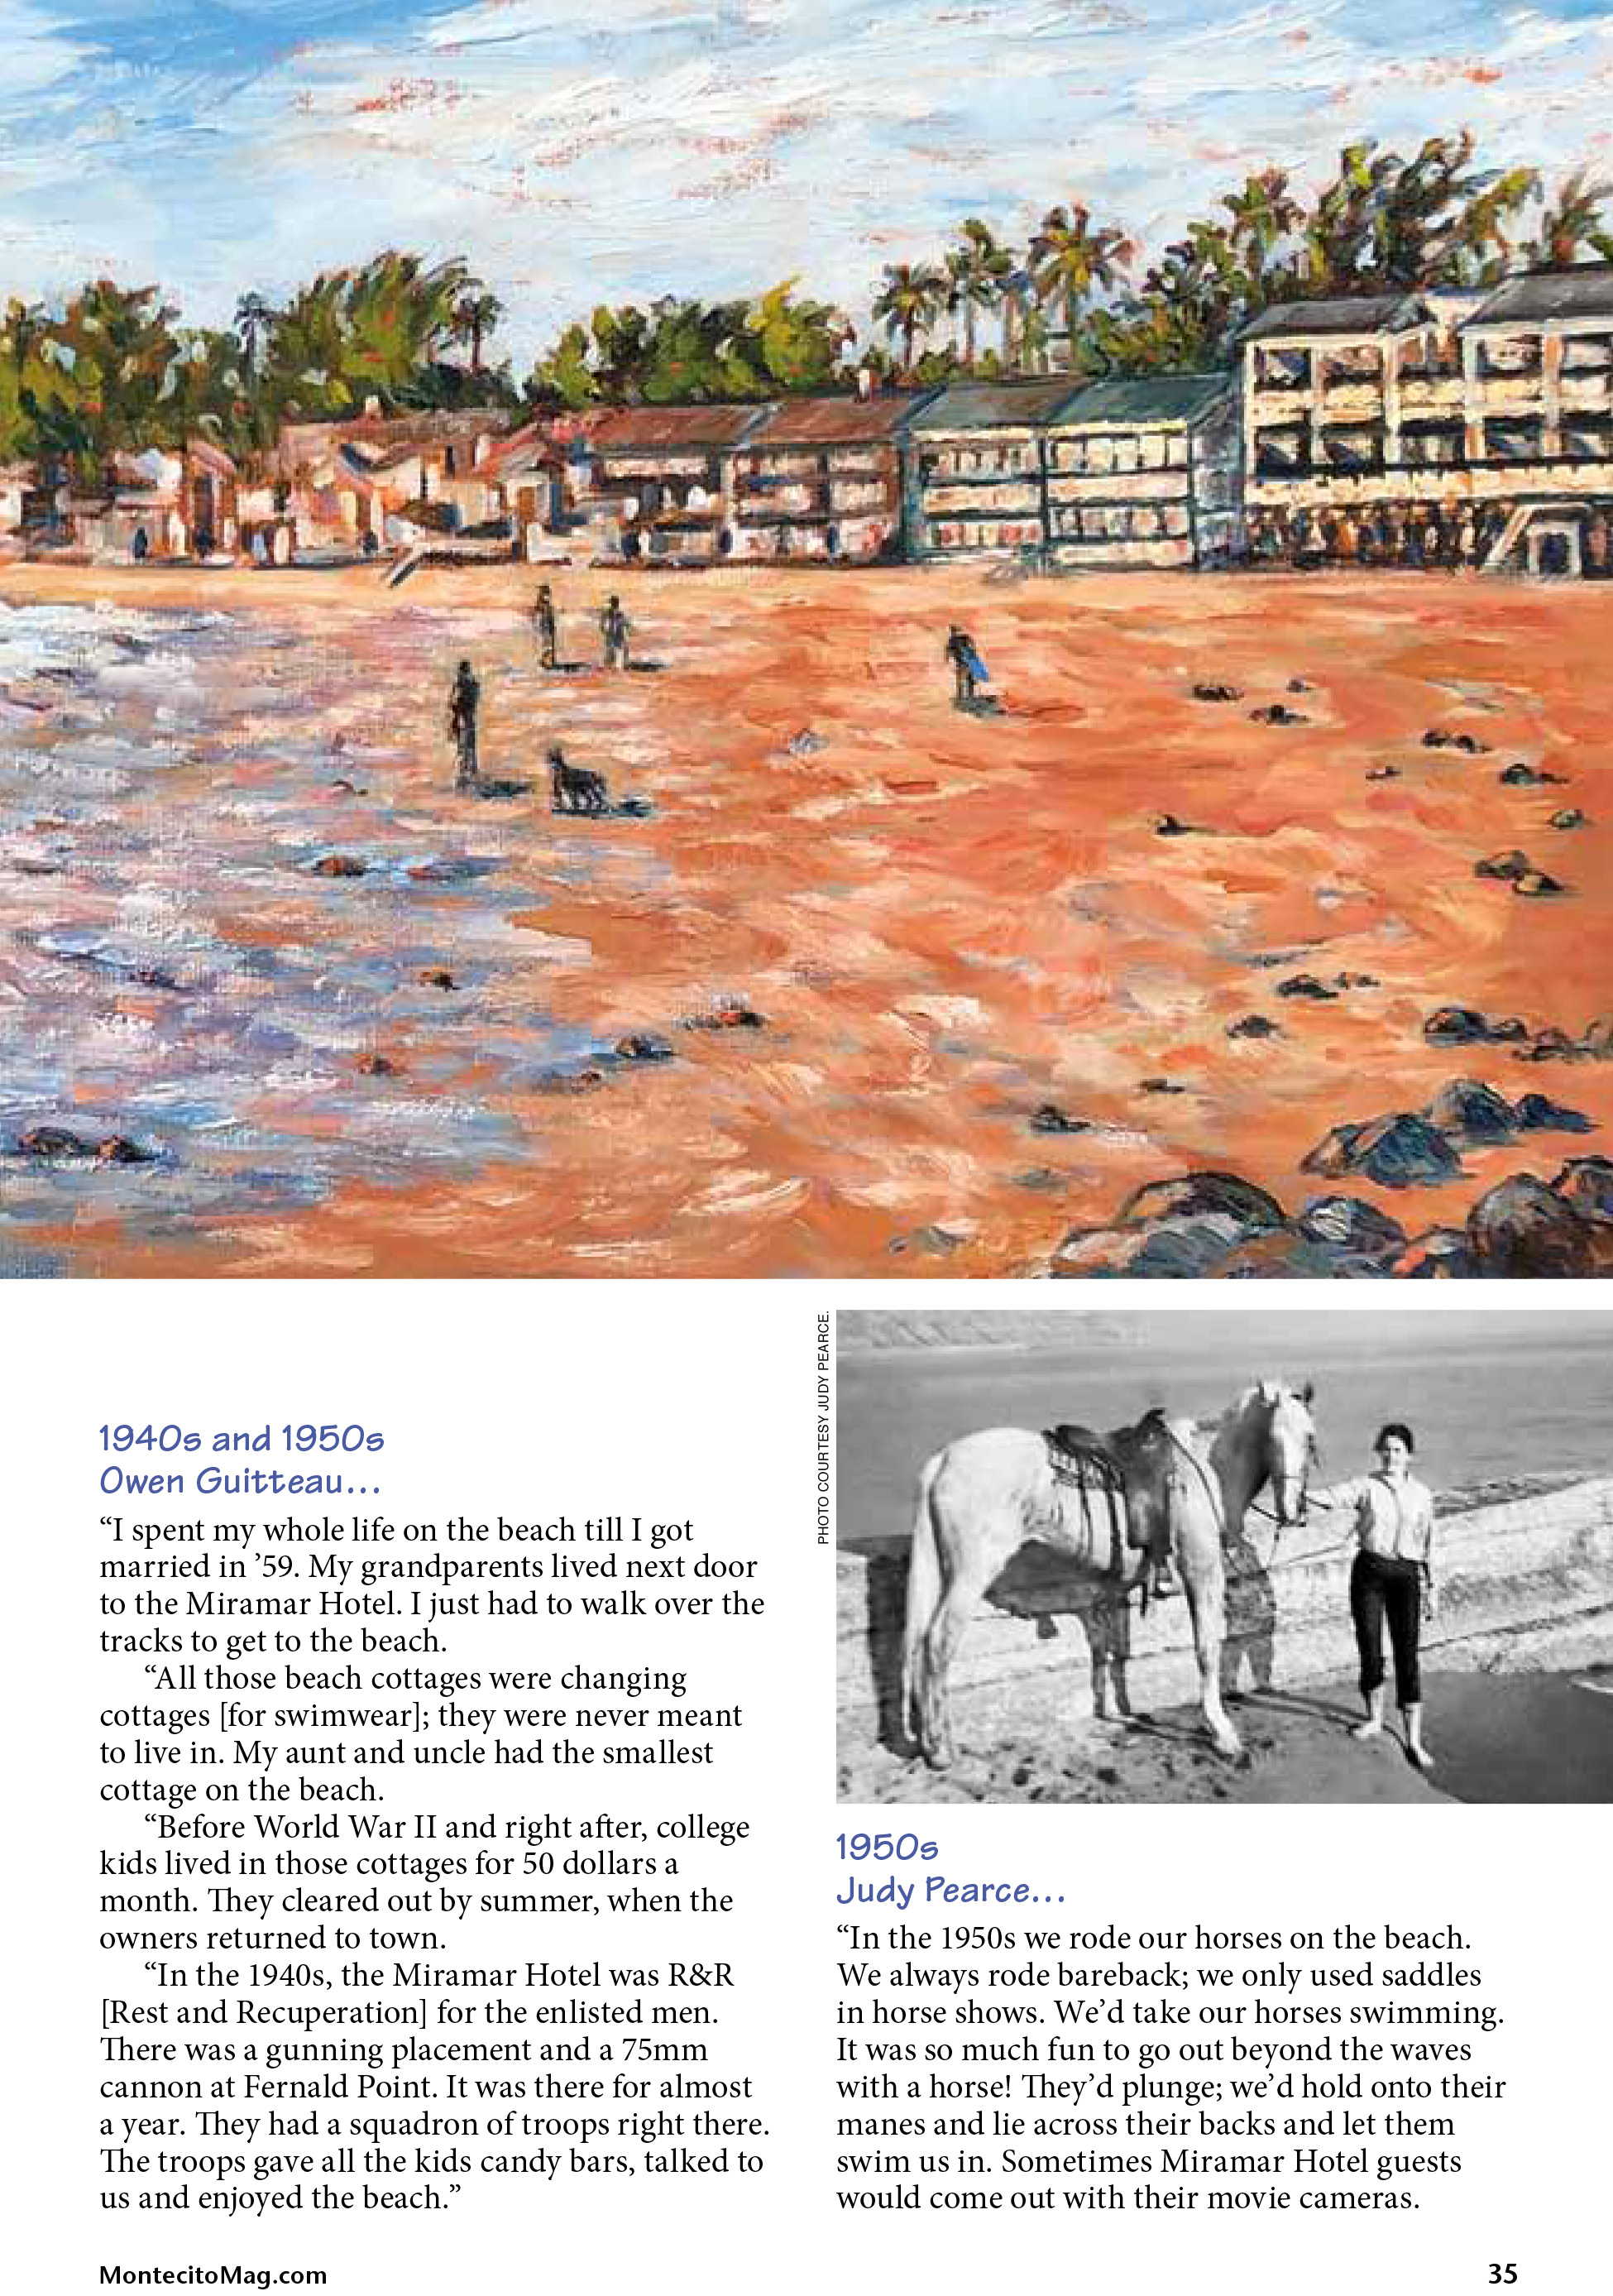 MM--iramar-Beach-Memories-4.jpg